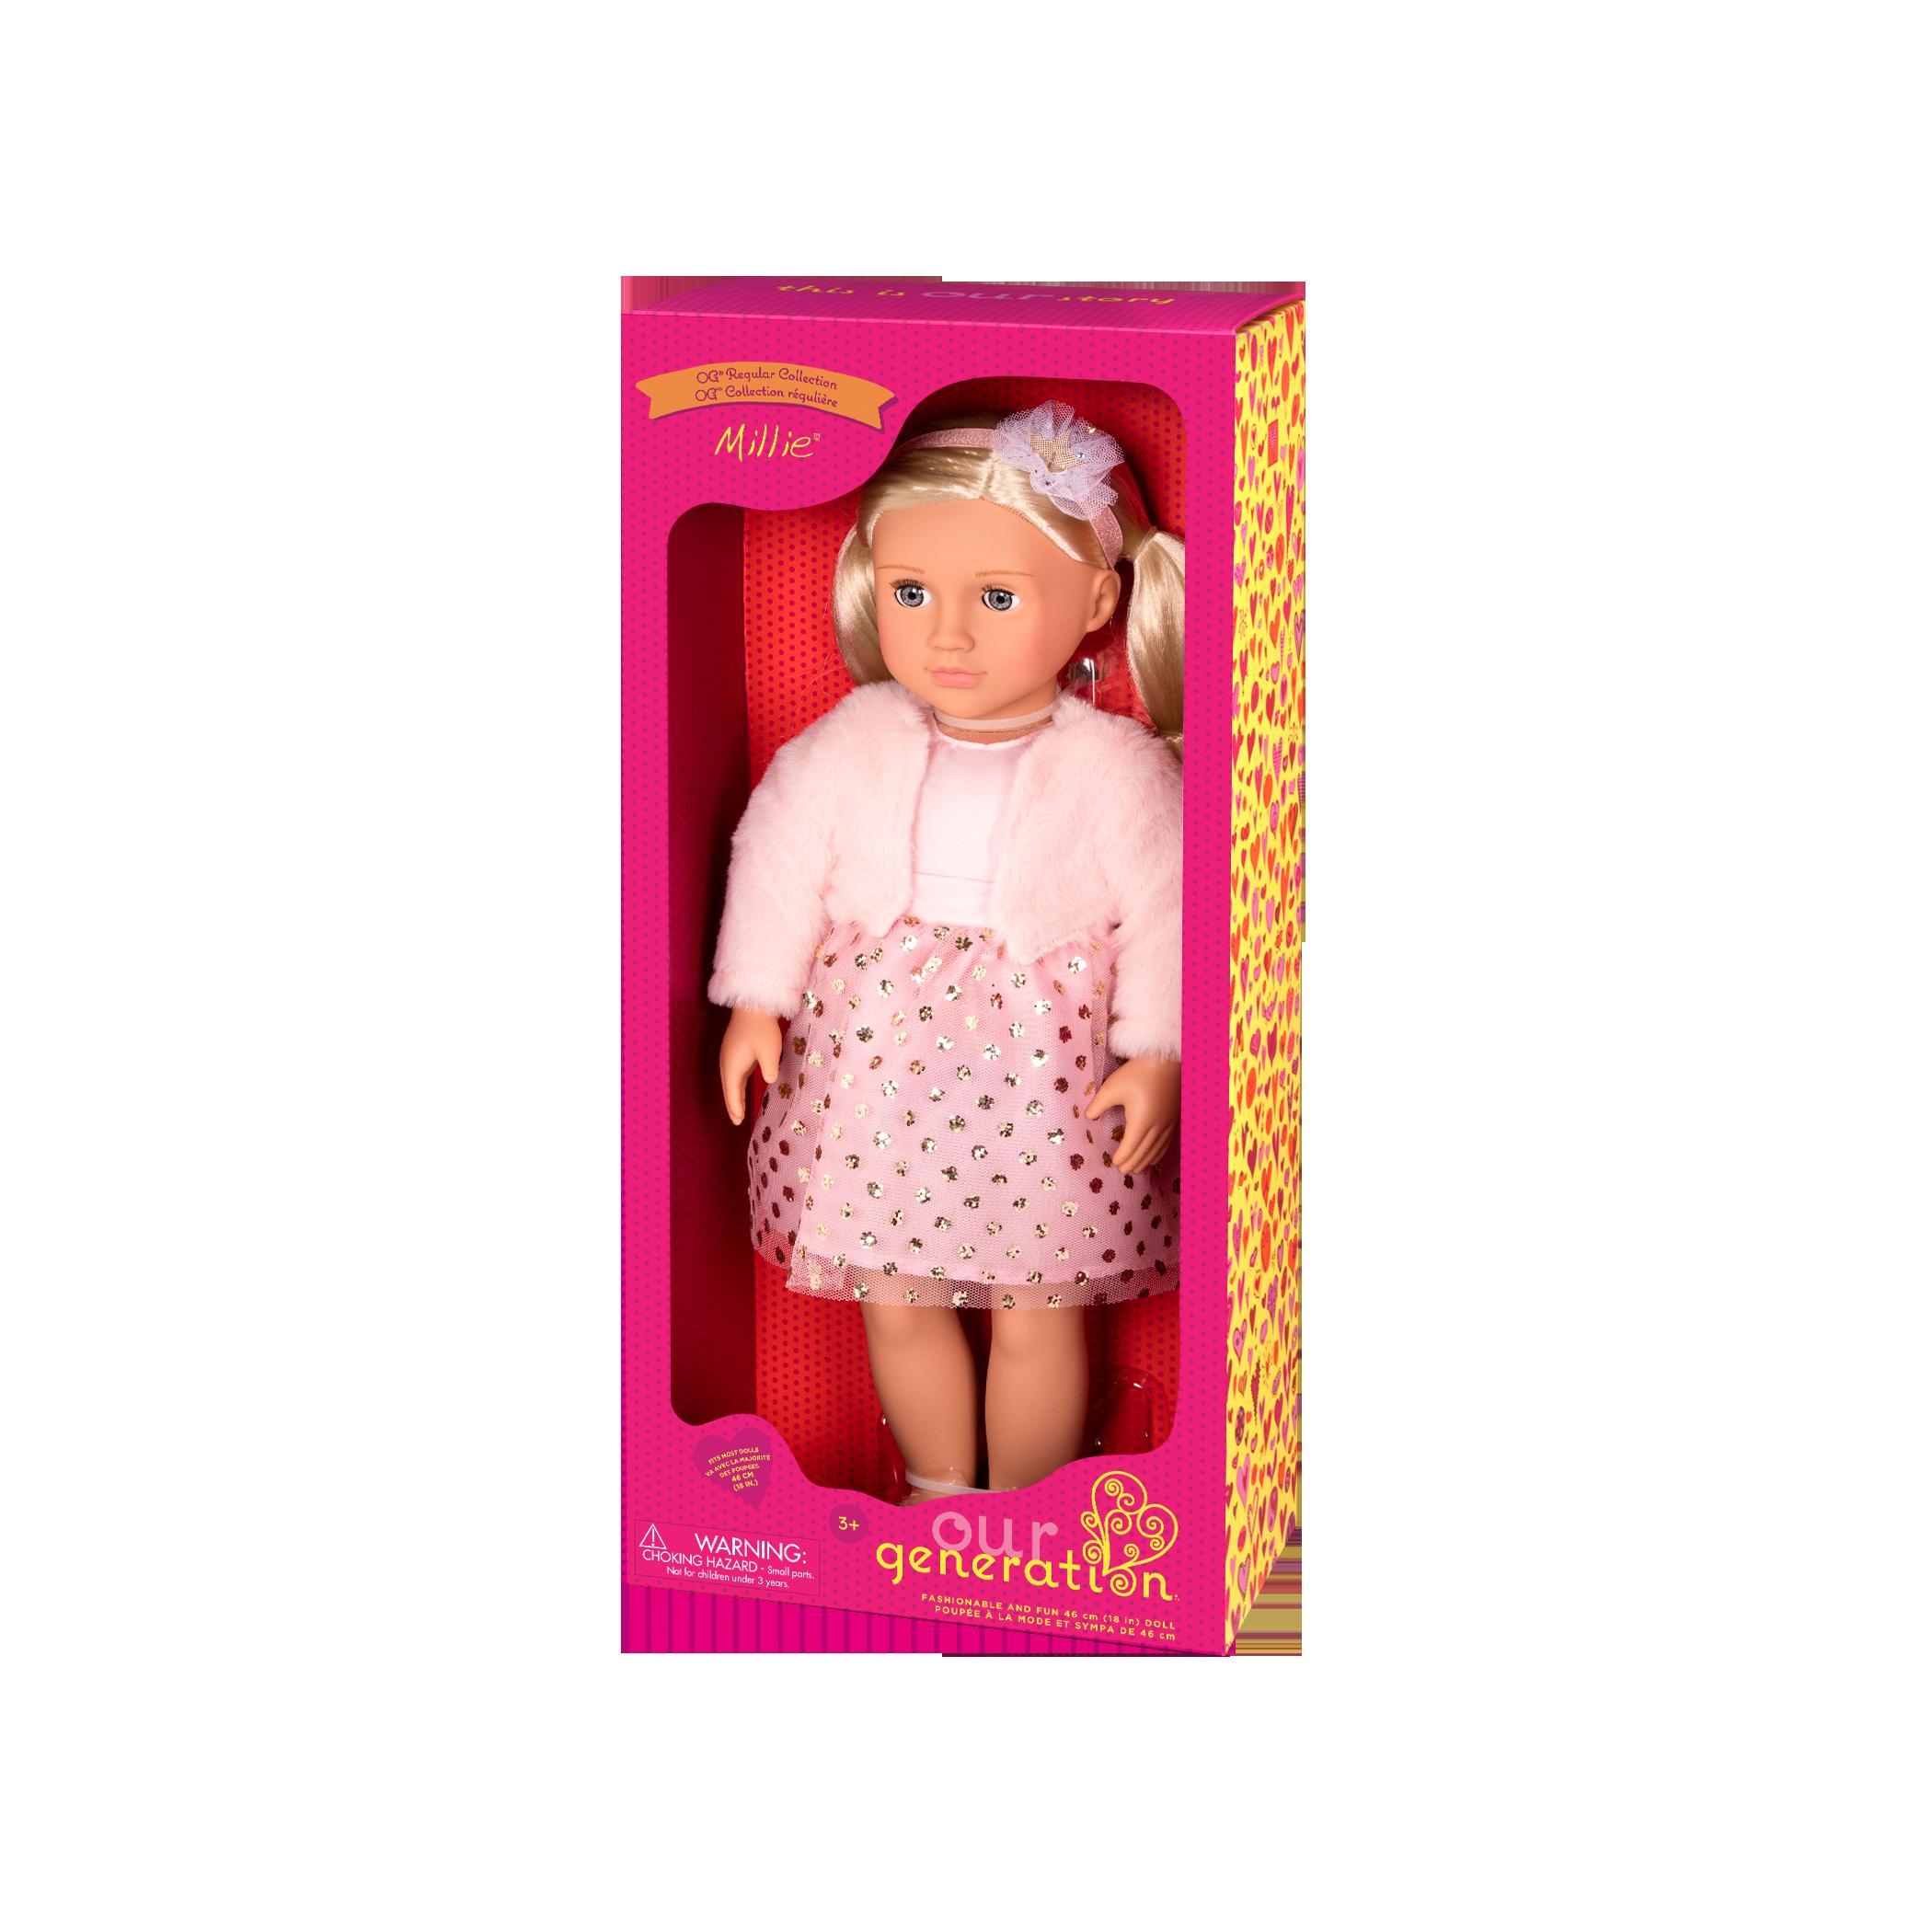 Millie Regular 18-inch Doll in packaging